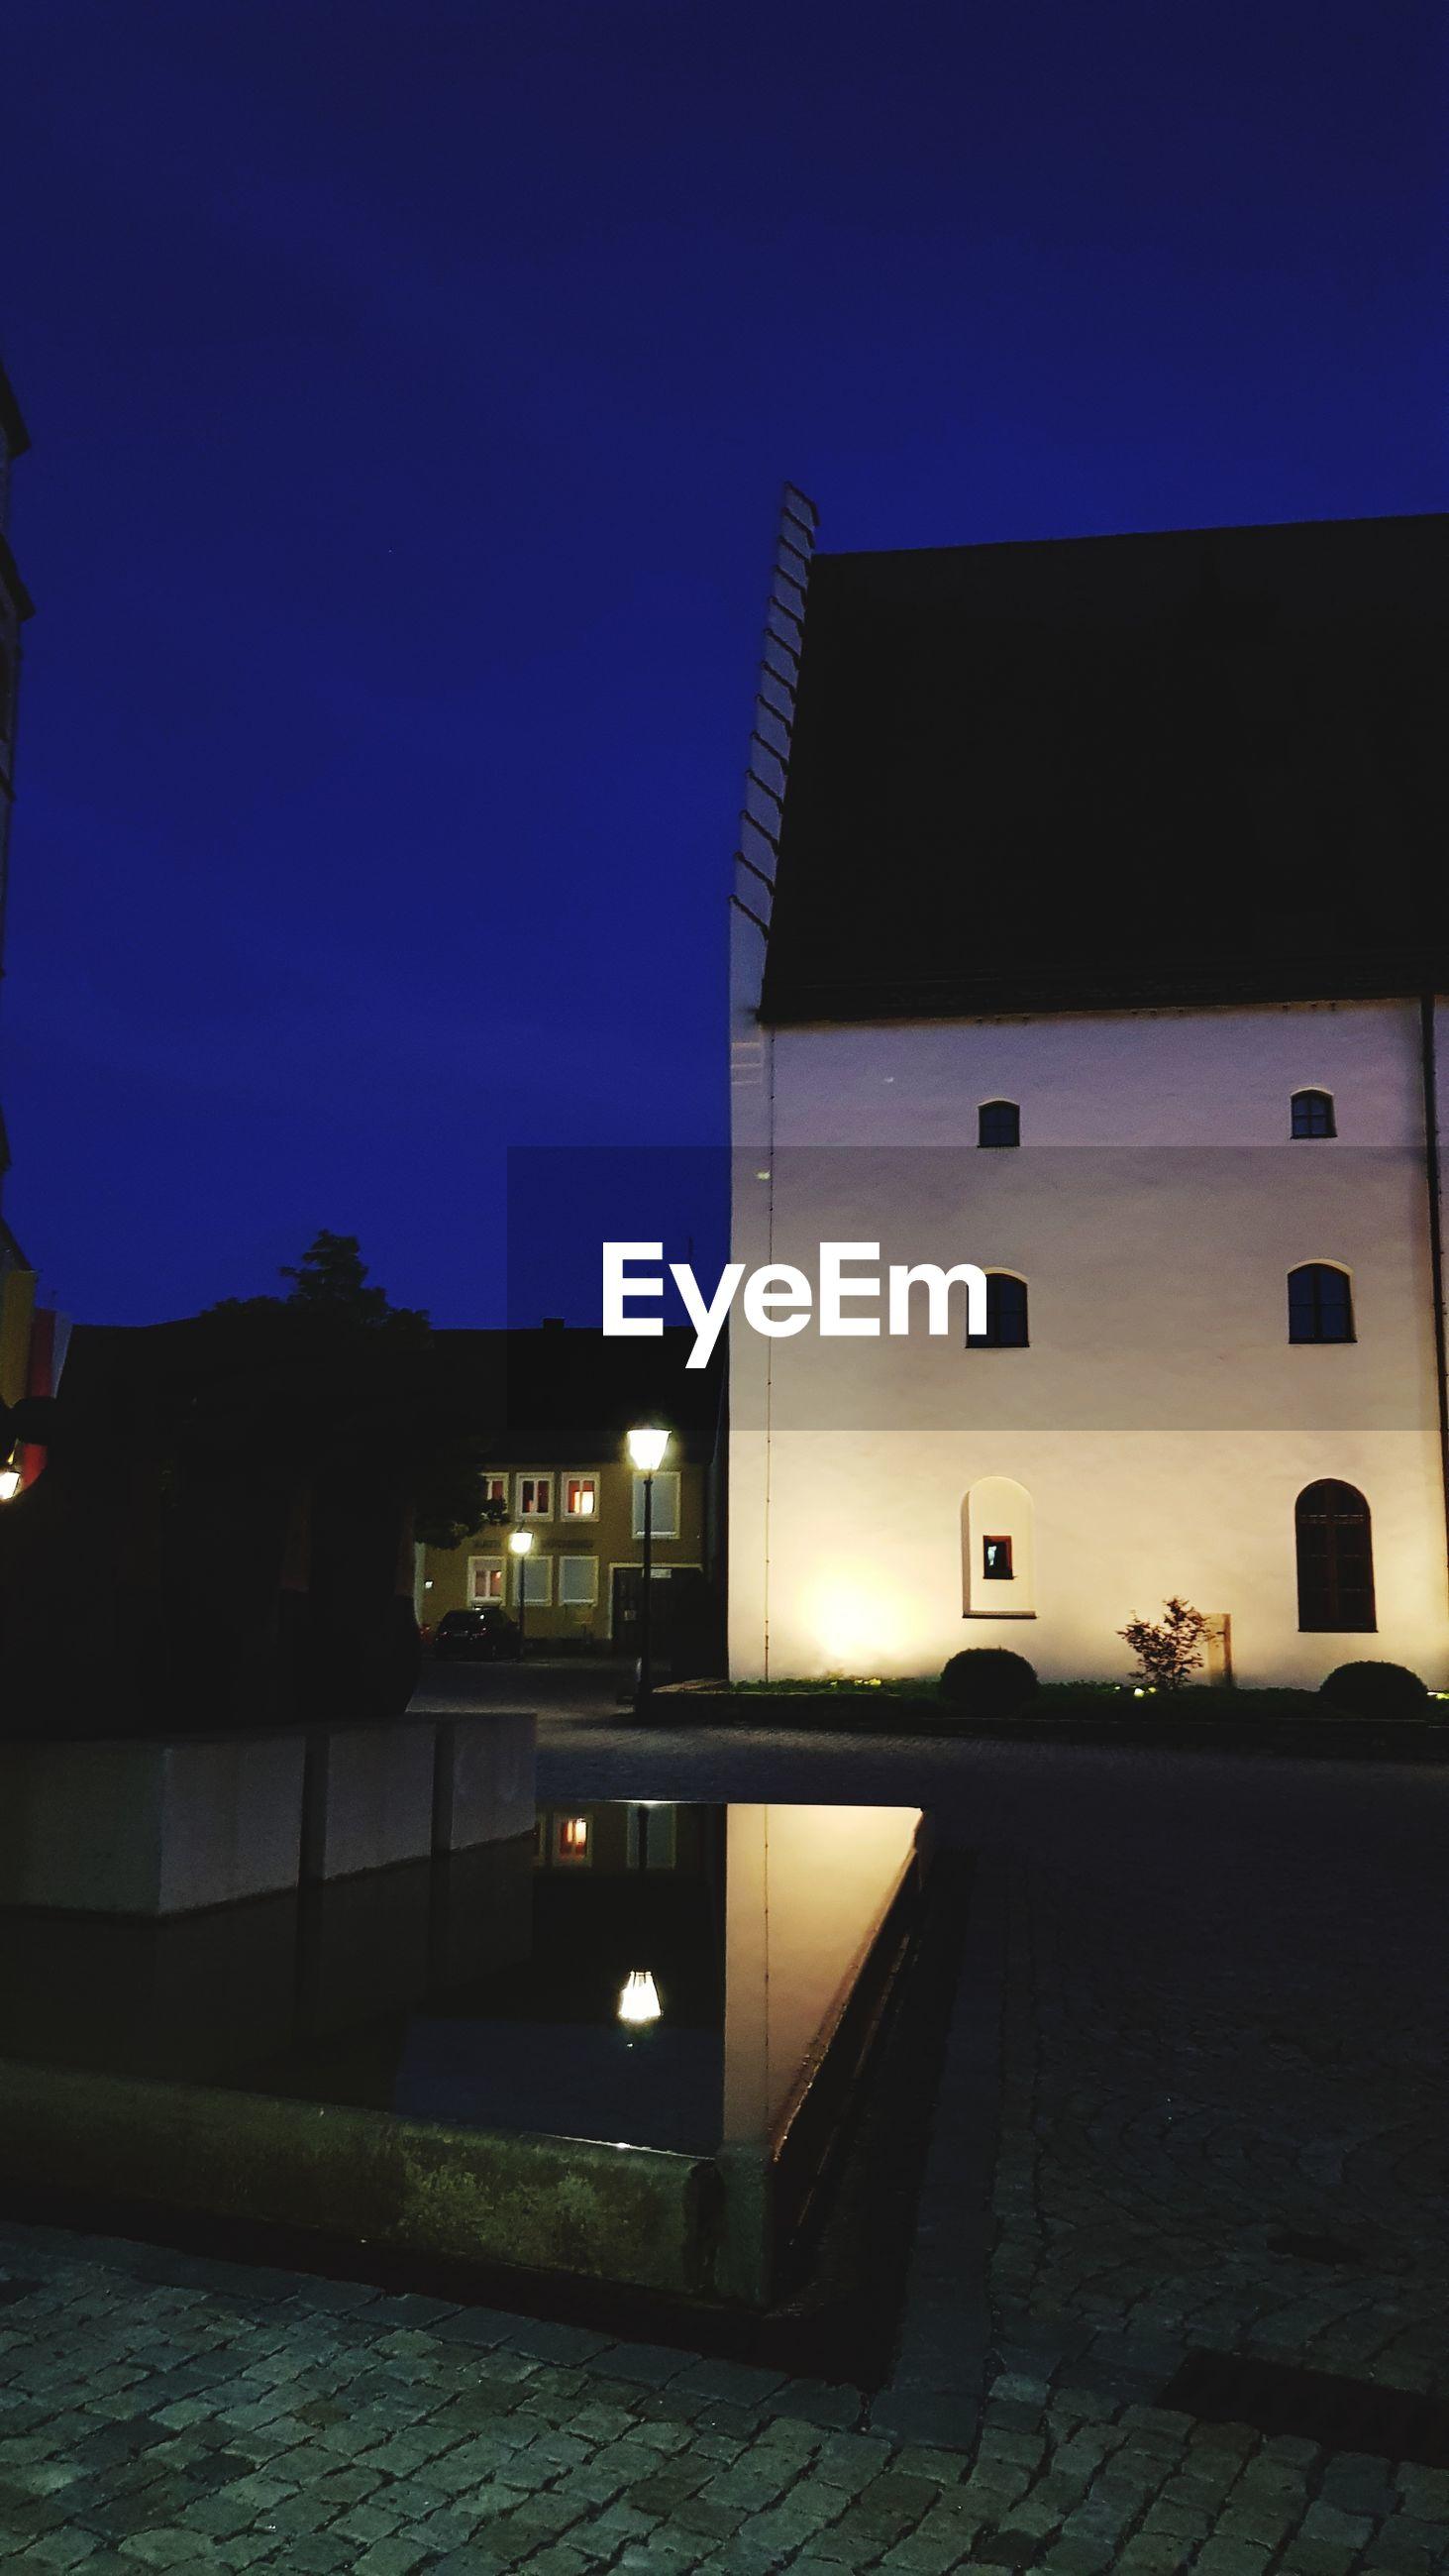 ILLUMINATED BUILDINGS AGAINST BLUE SKY AT NIGHT